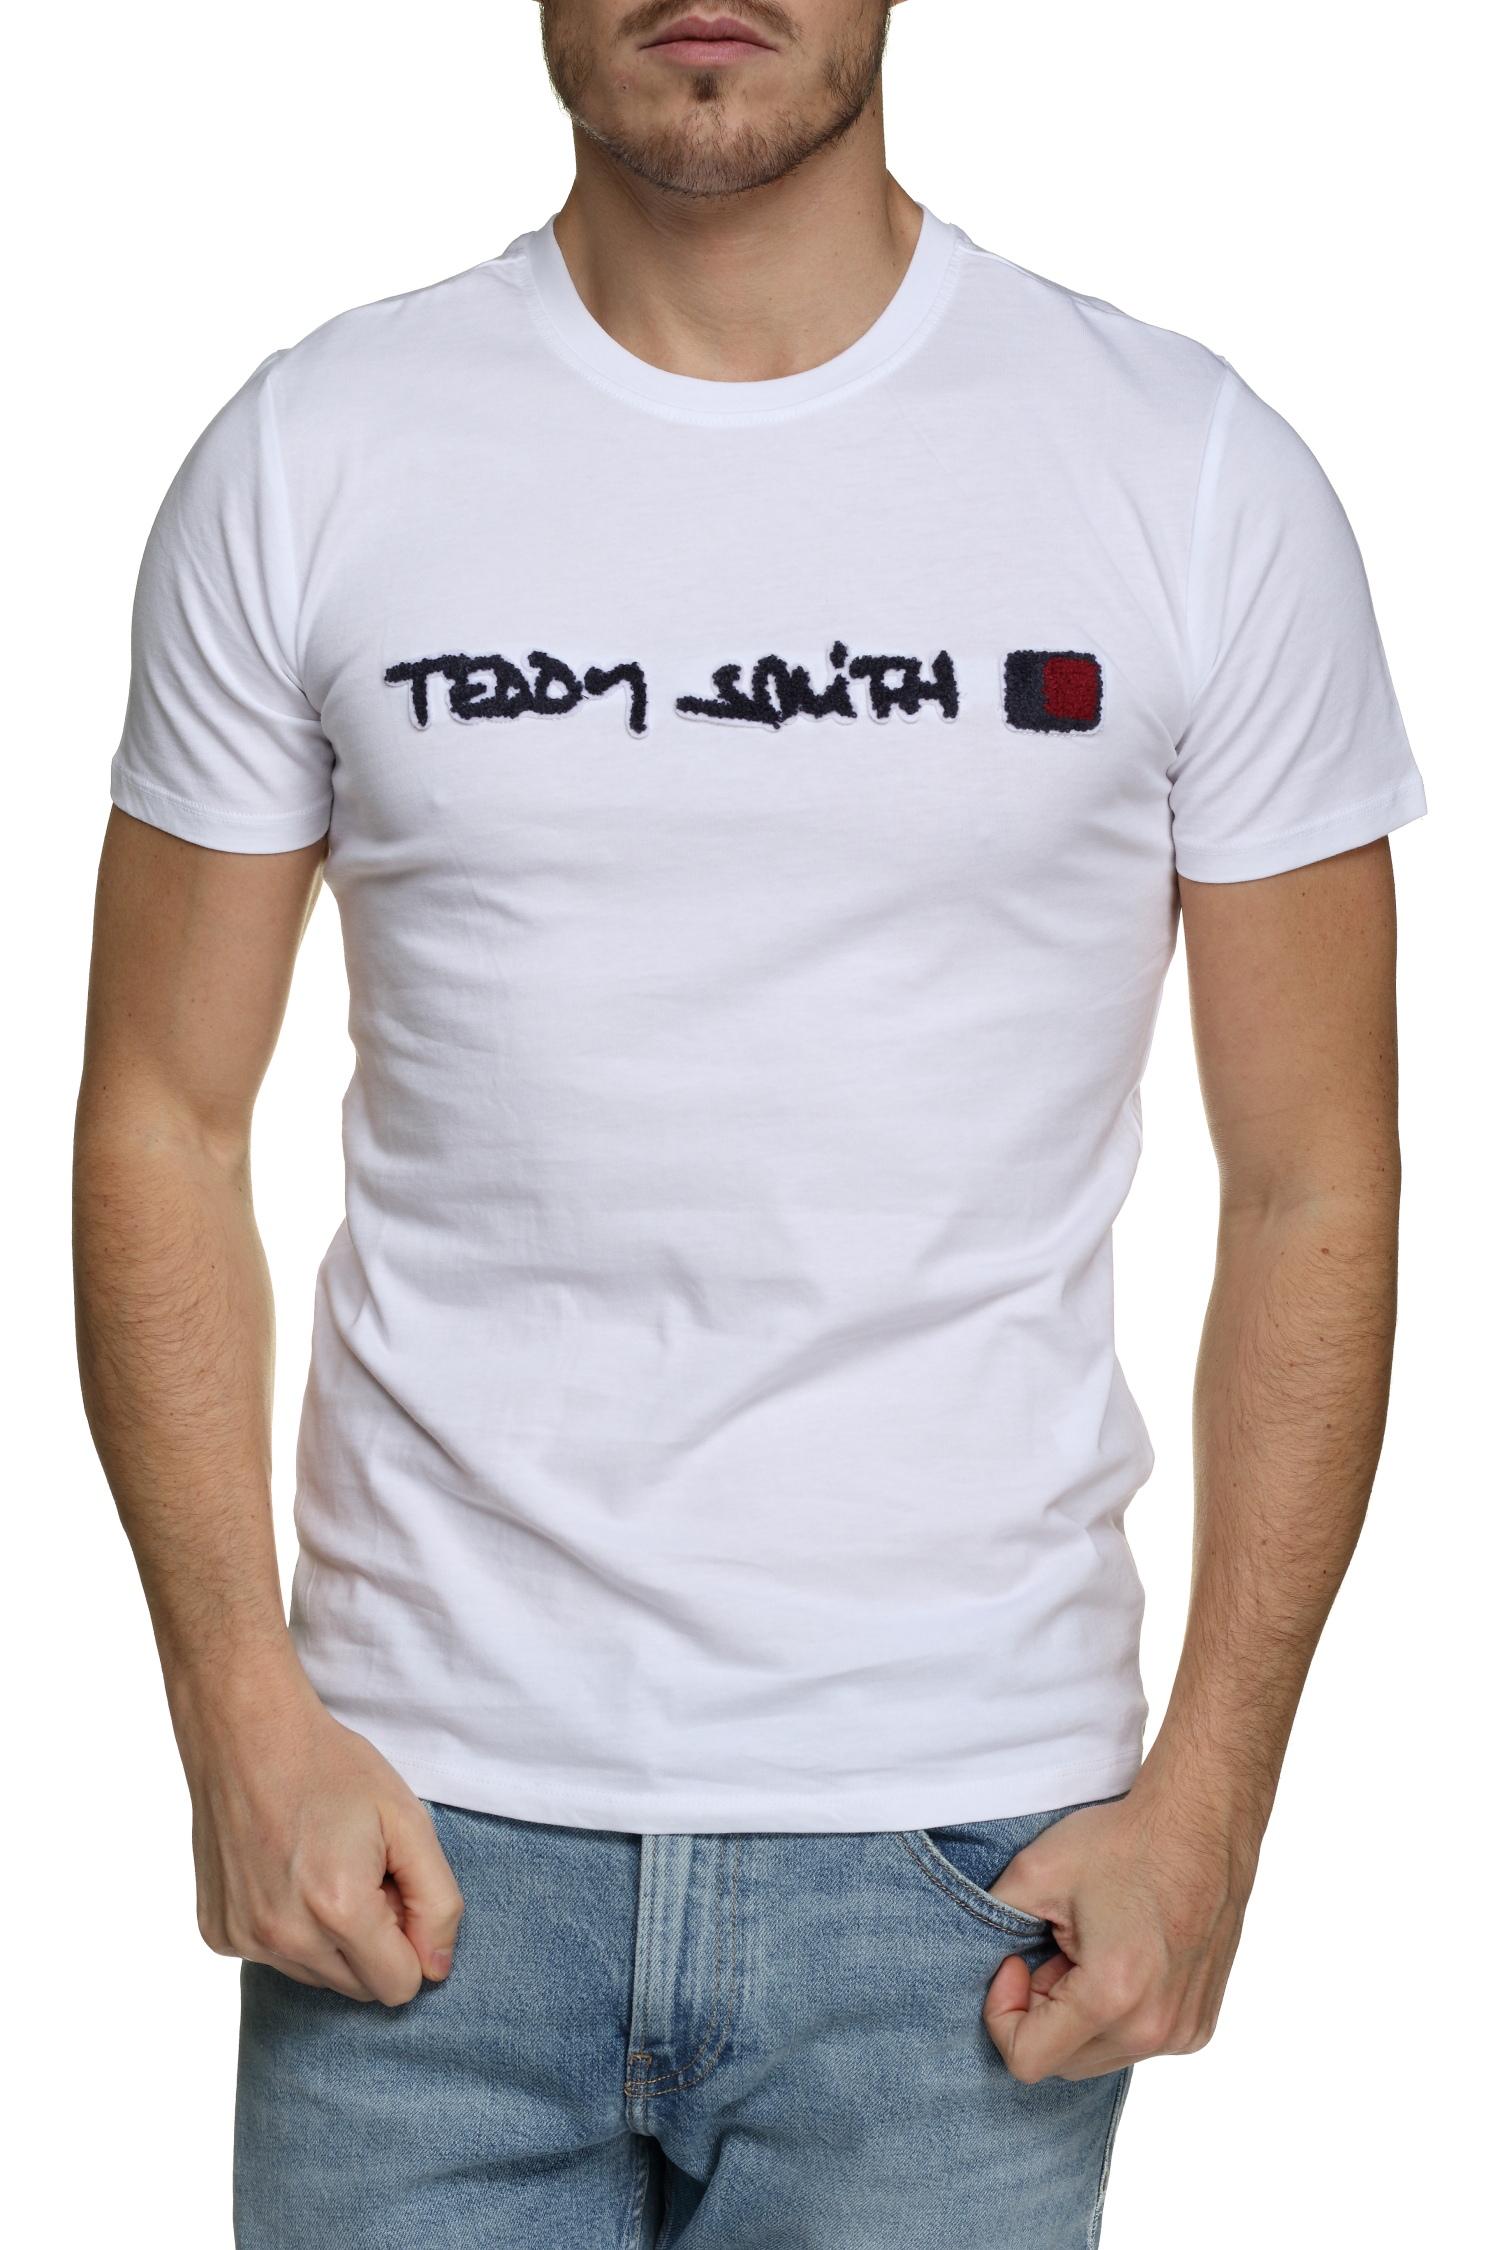 https://www.leadermode.com/196795/teddy-smith-t-clap-mc-11014740d-202-blanc.jpg